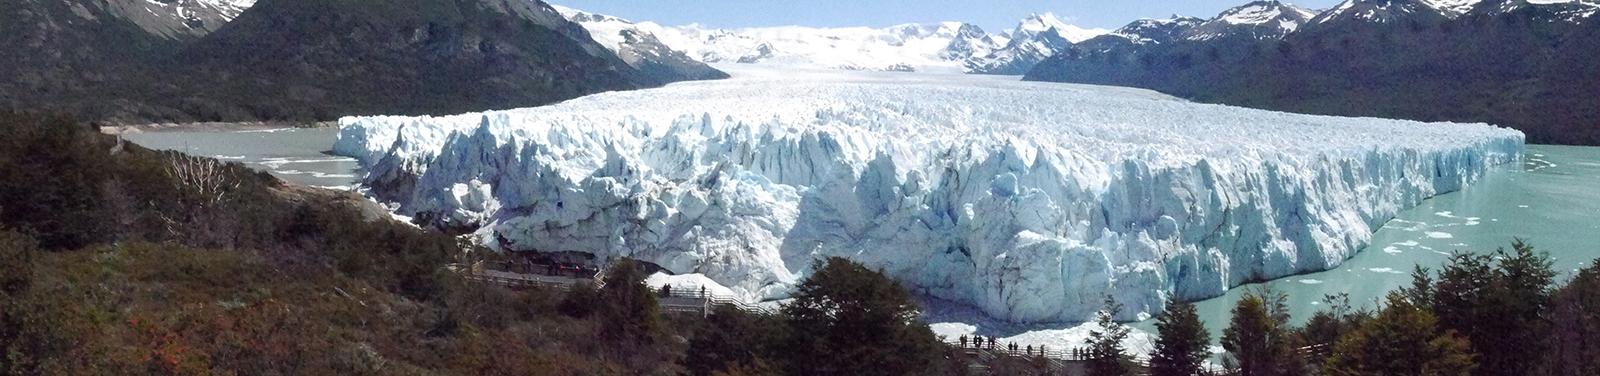 Glettscher Perito Merino, Parque Nacional de Glaciares, Argentinien